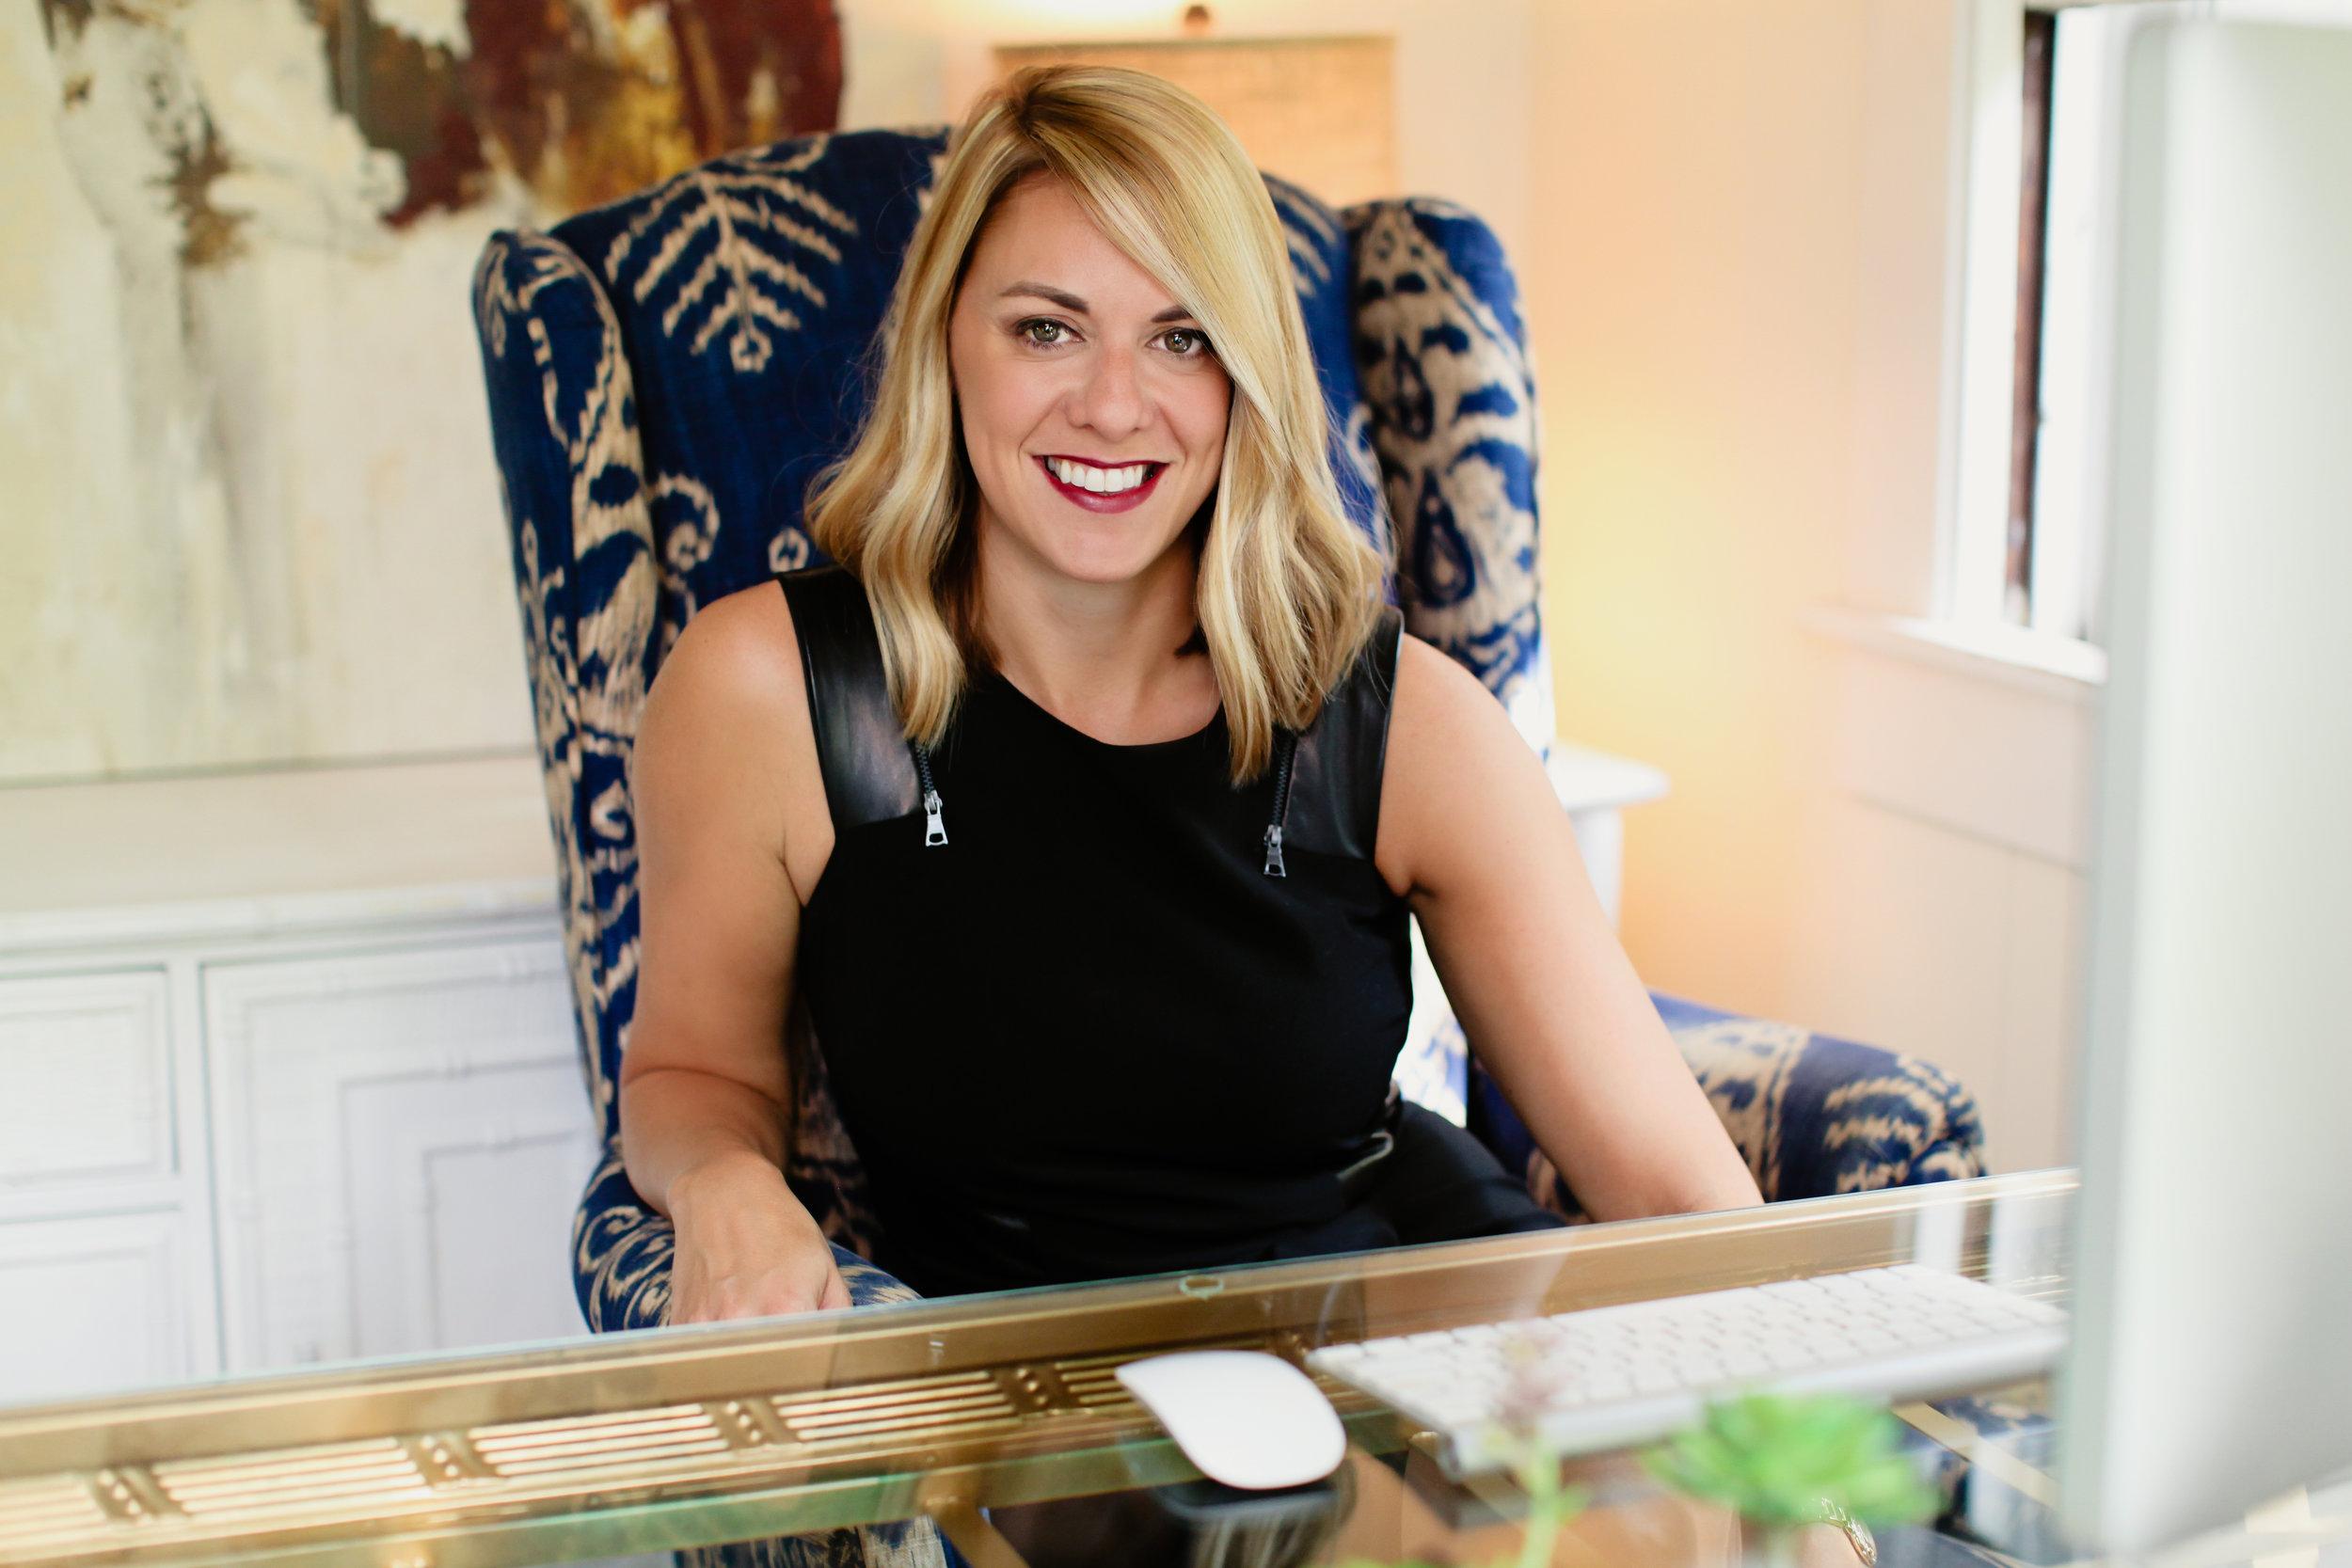 Megan-Shroy-Small-Business-Resolutions-2018.jpg